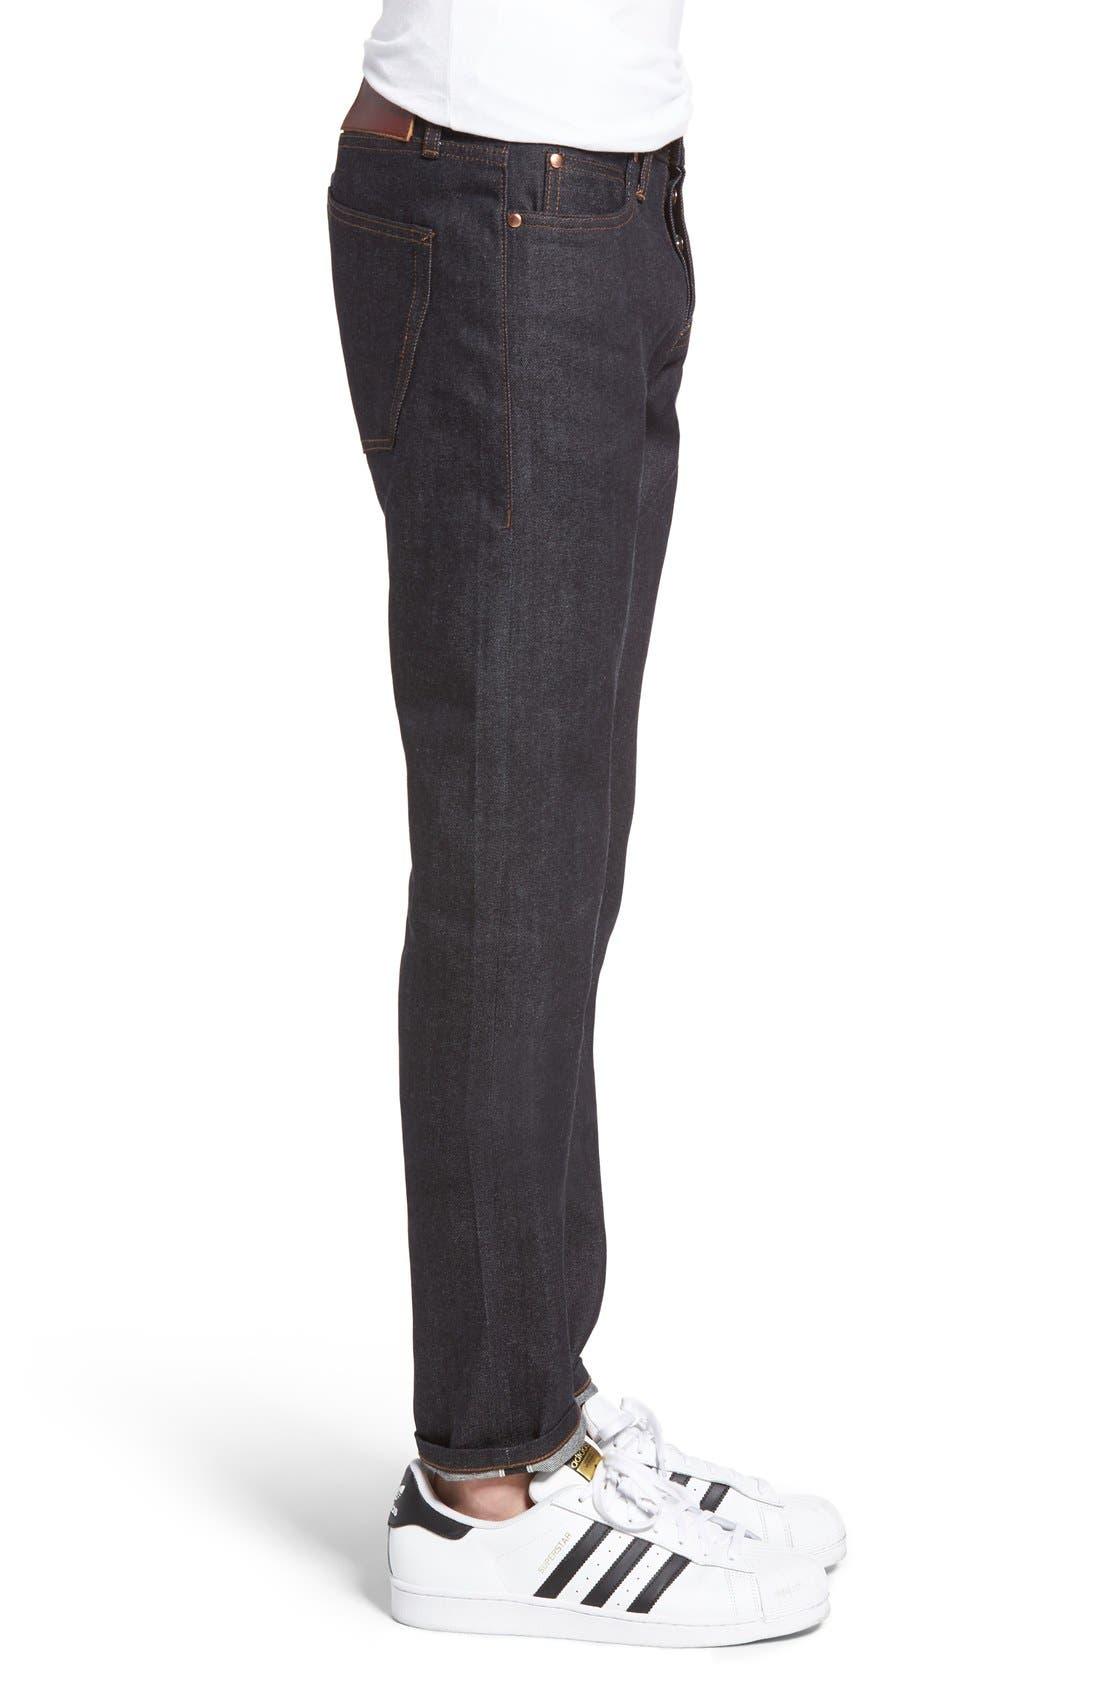 UB422 Selvedge Skinny Fit Jeans,                             Alternate thumbnail 3, color,                             401